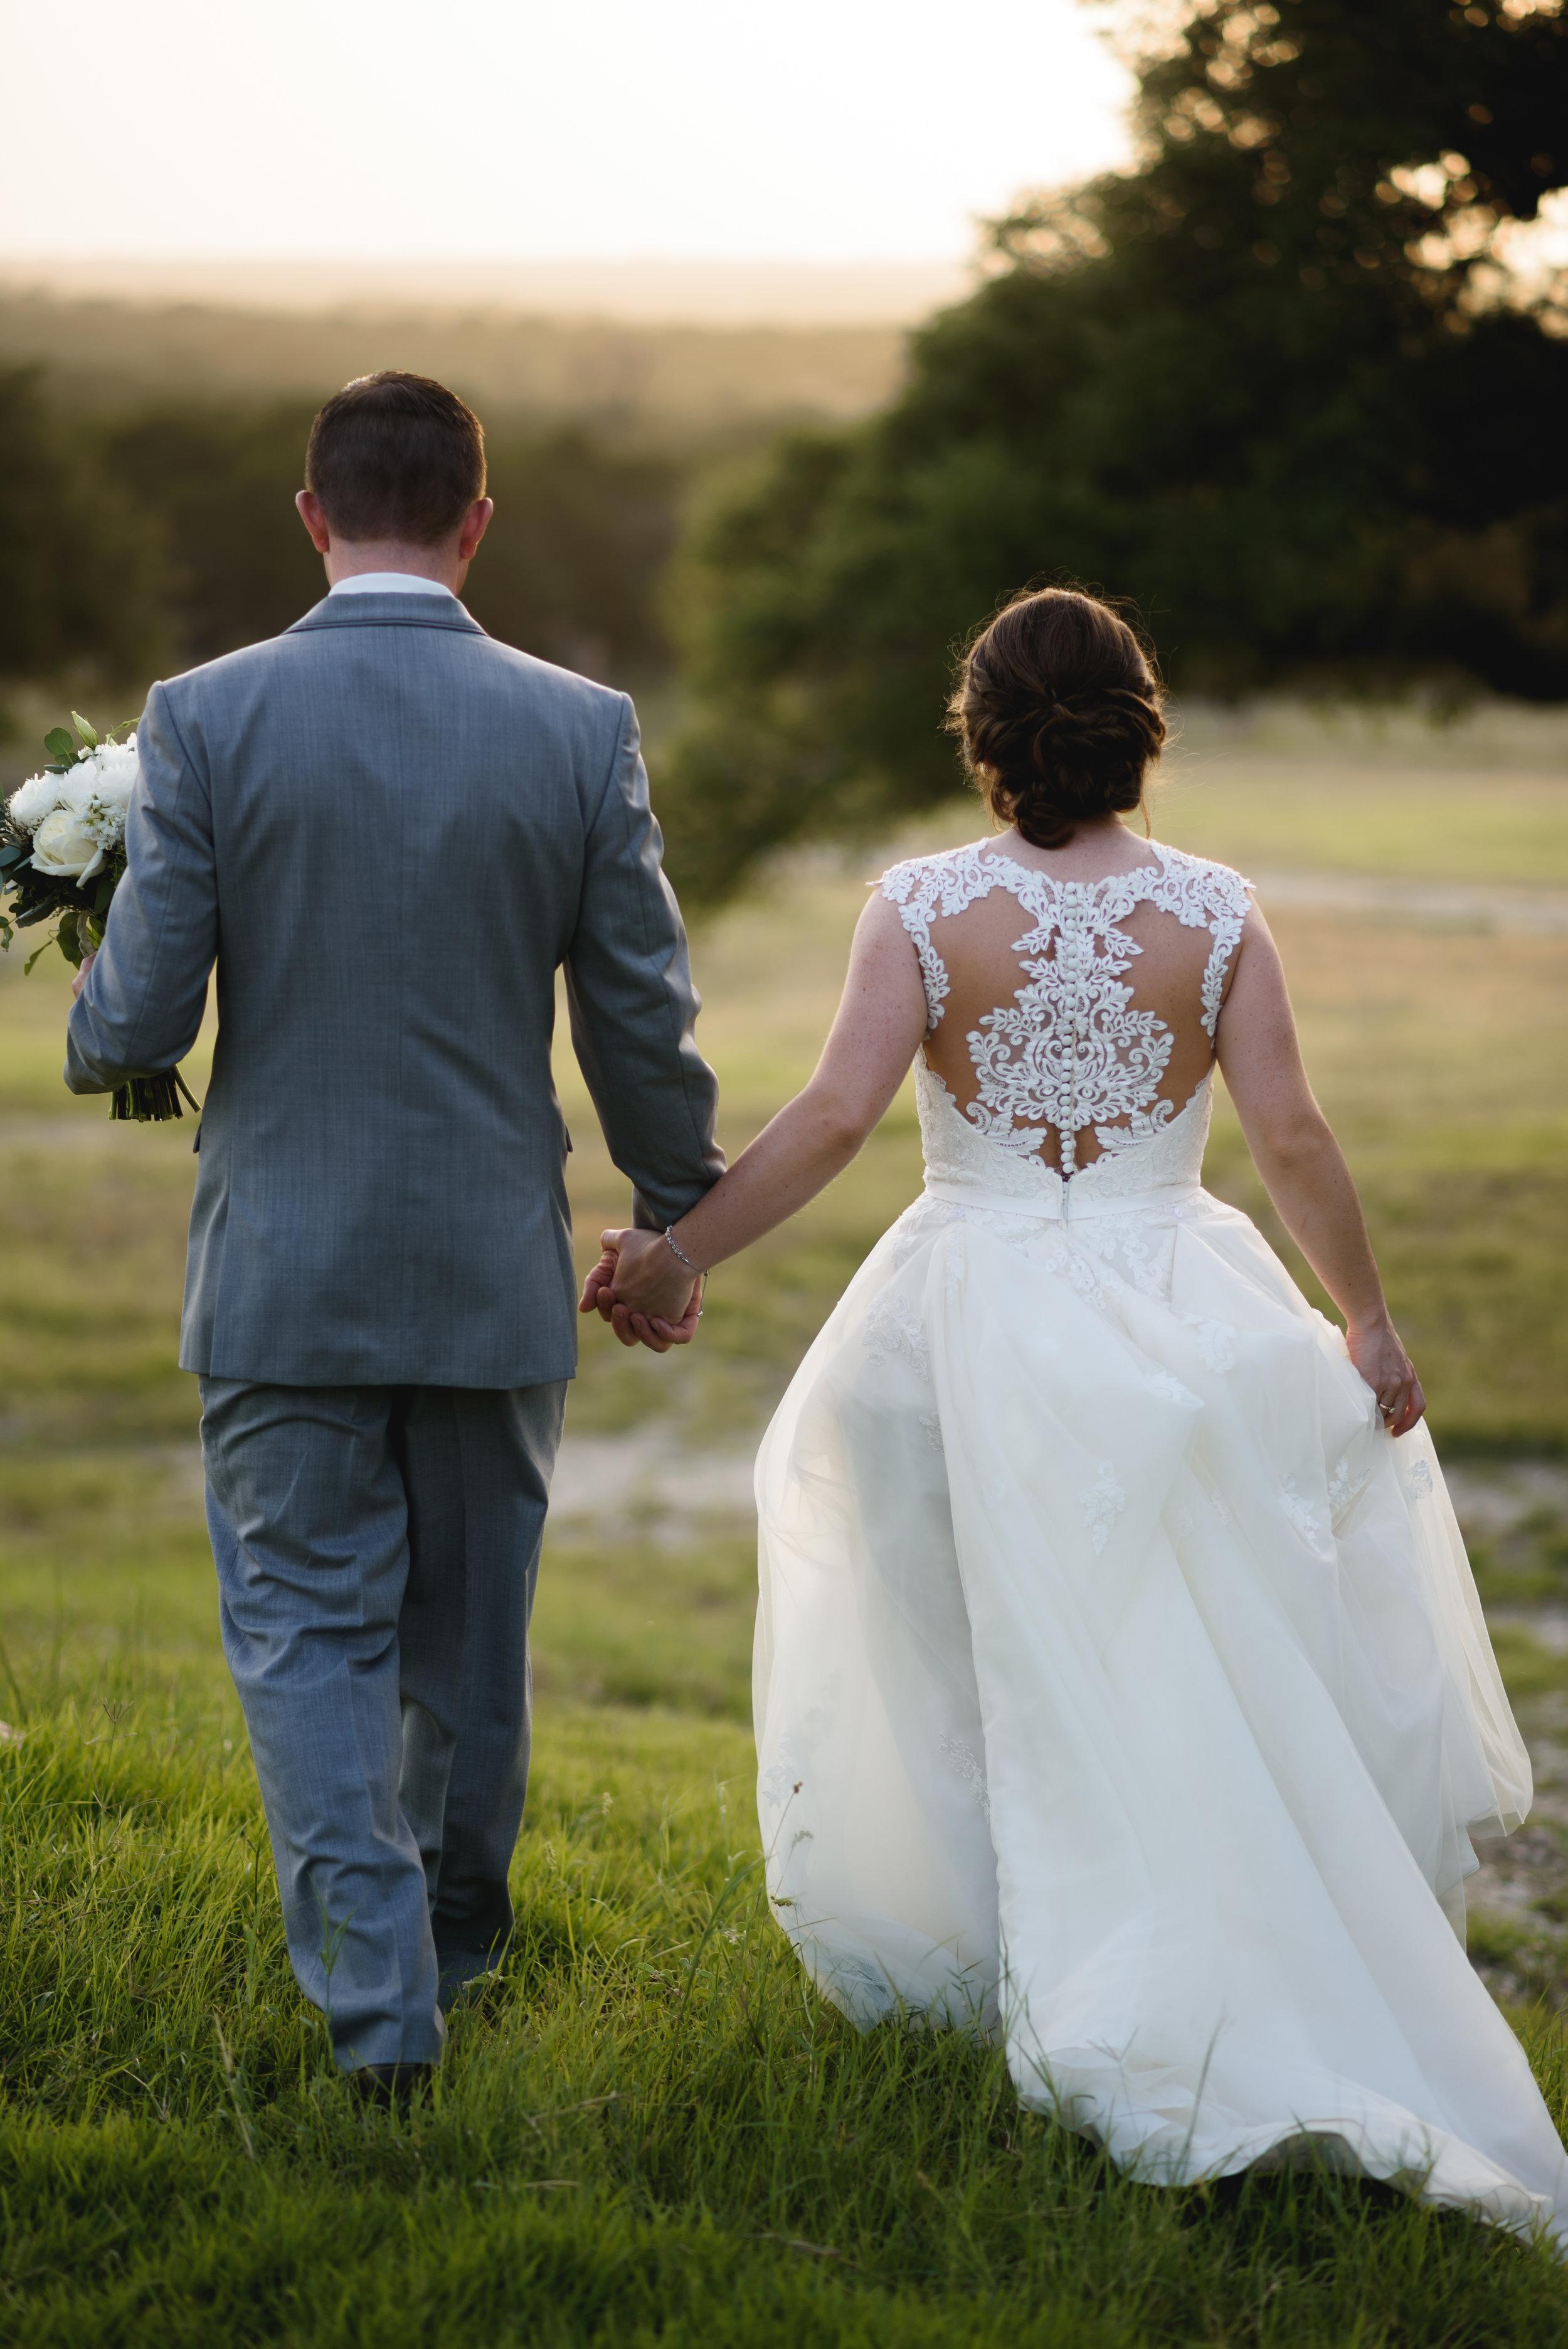 Jessica-and-Neil-wedding-2018 (719 of 937).JPG